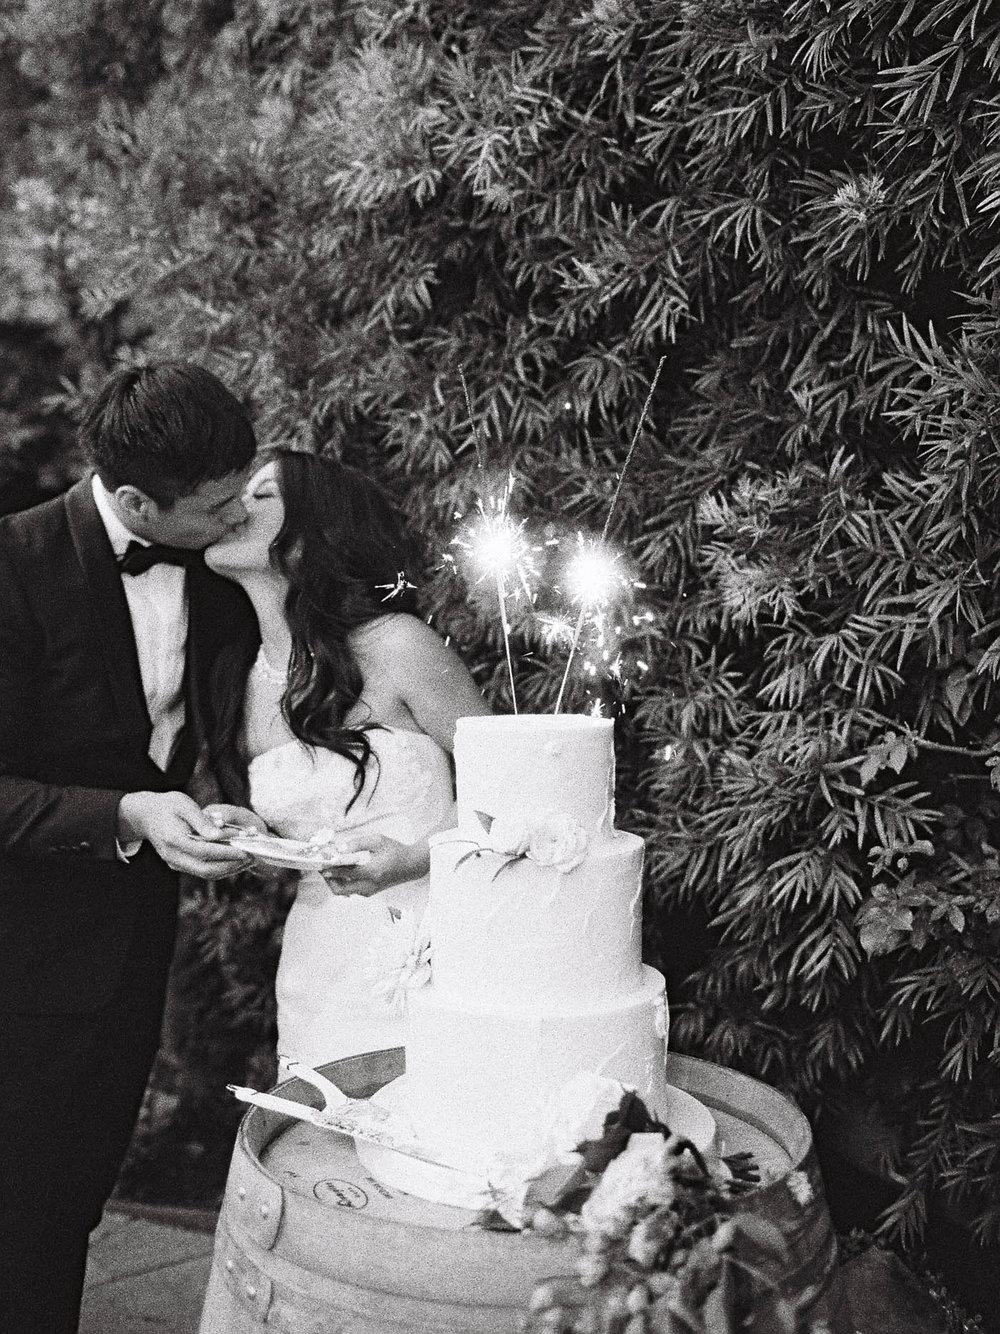 franciscan-gardens-wedding-27-Jen_Huang-000564-R1-019.jpg